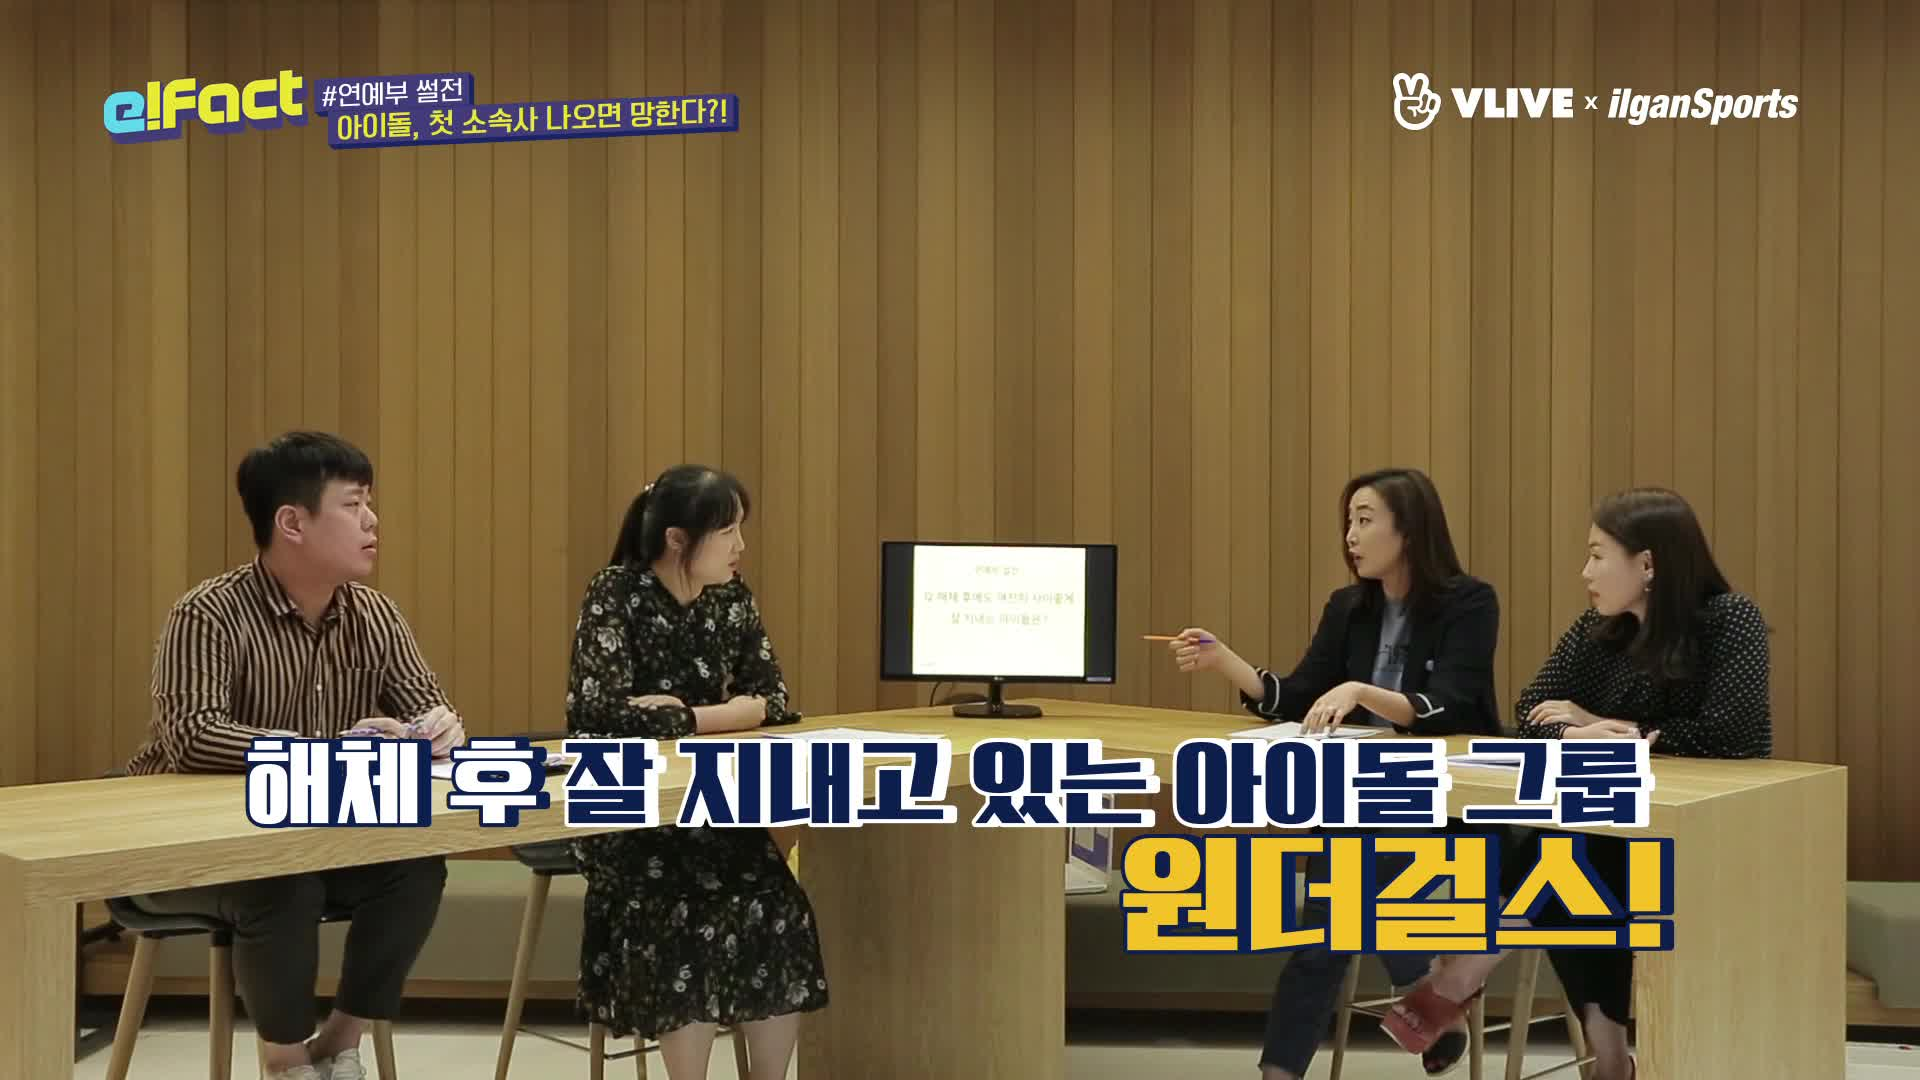 [e!Fact_연예부 썰전] 아이돌, 첫 소속사 나오면 망한다?! feat.무서운 진실 ㄷㄷㄷ